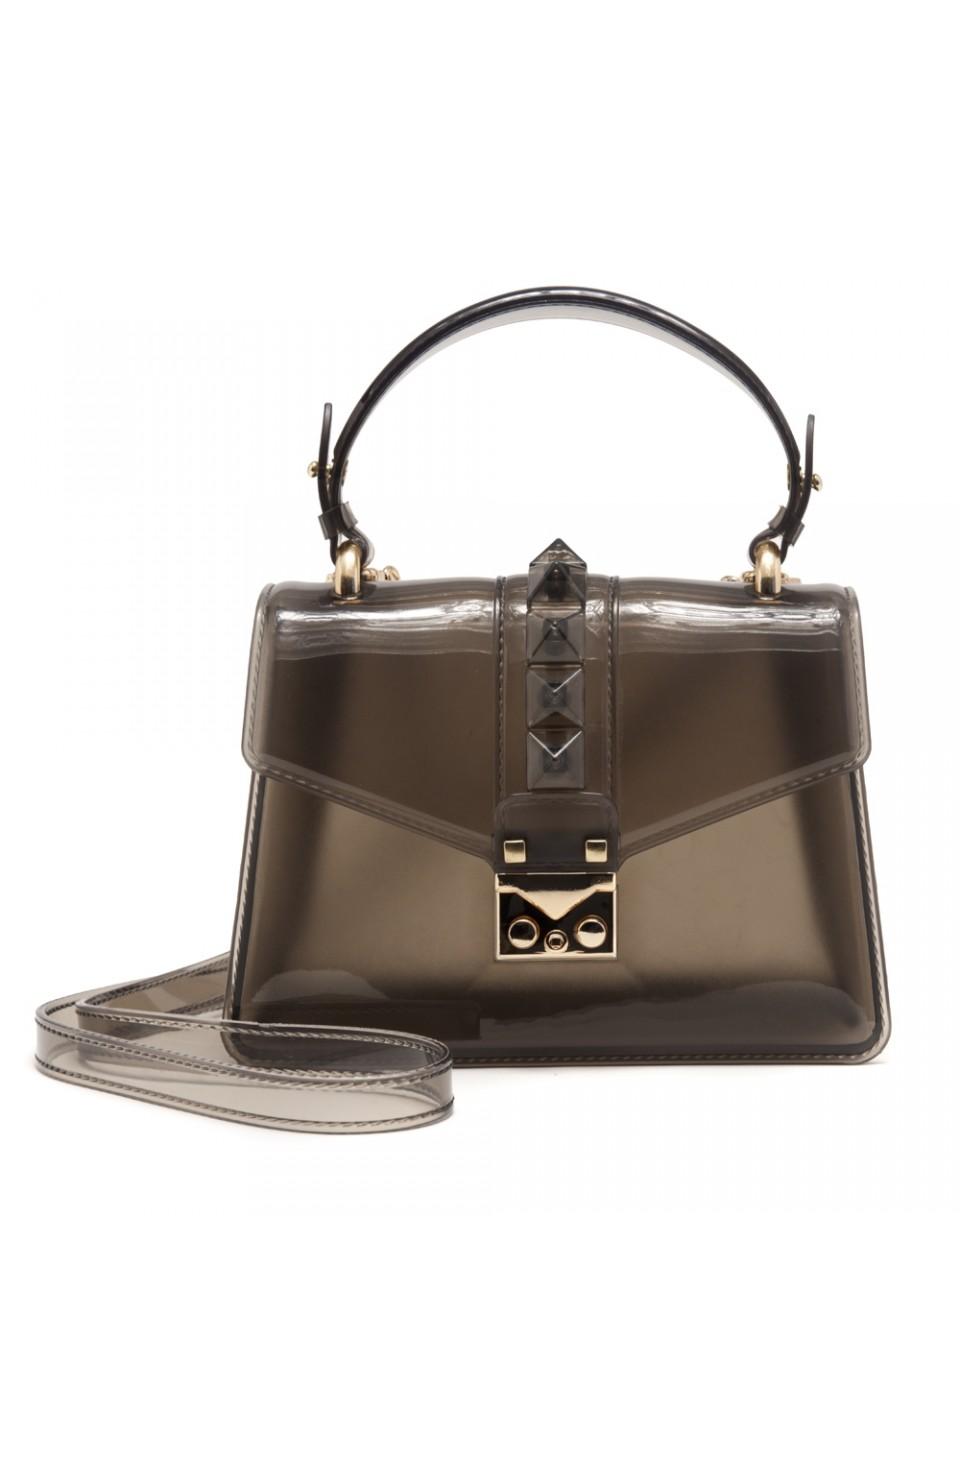 SZ17-LH2-16574 - Women's PVC Jelly Top Handle Bag (Black)